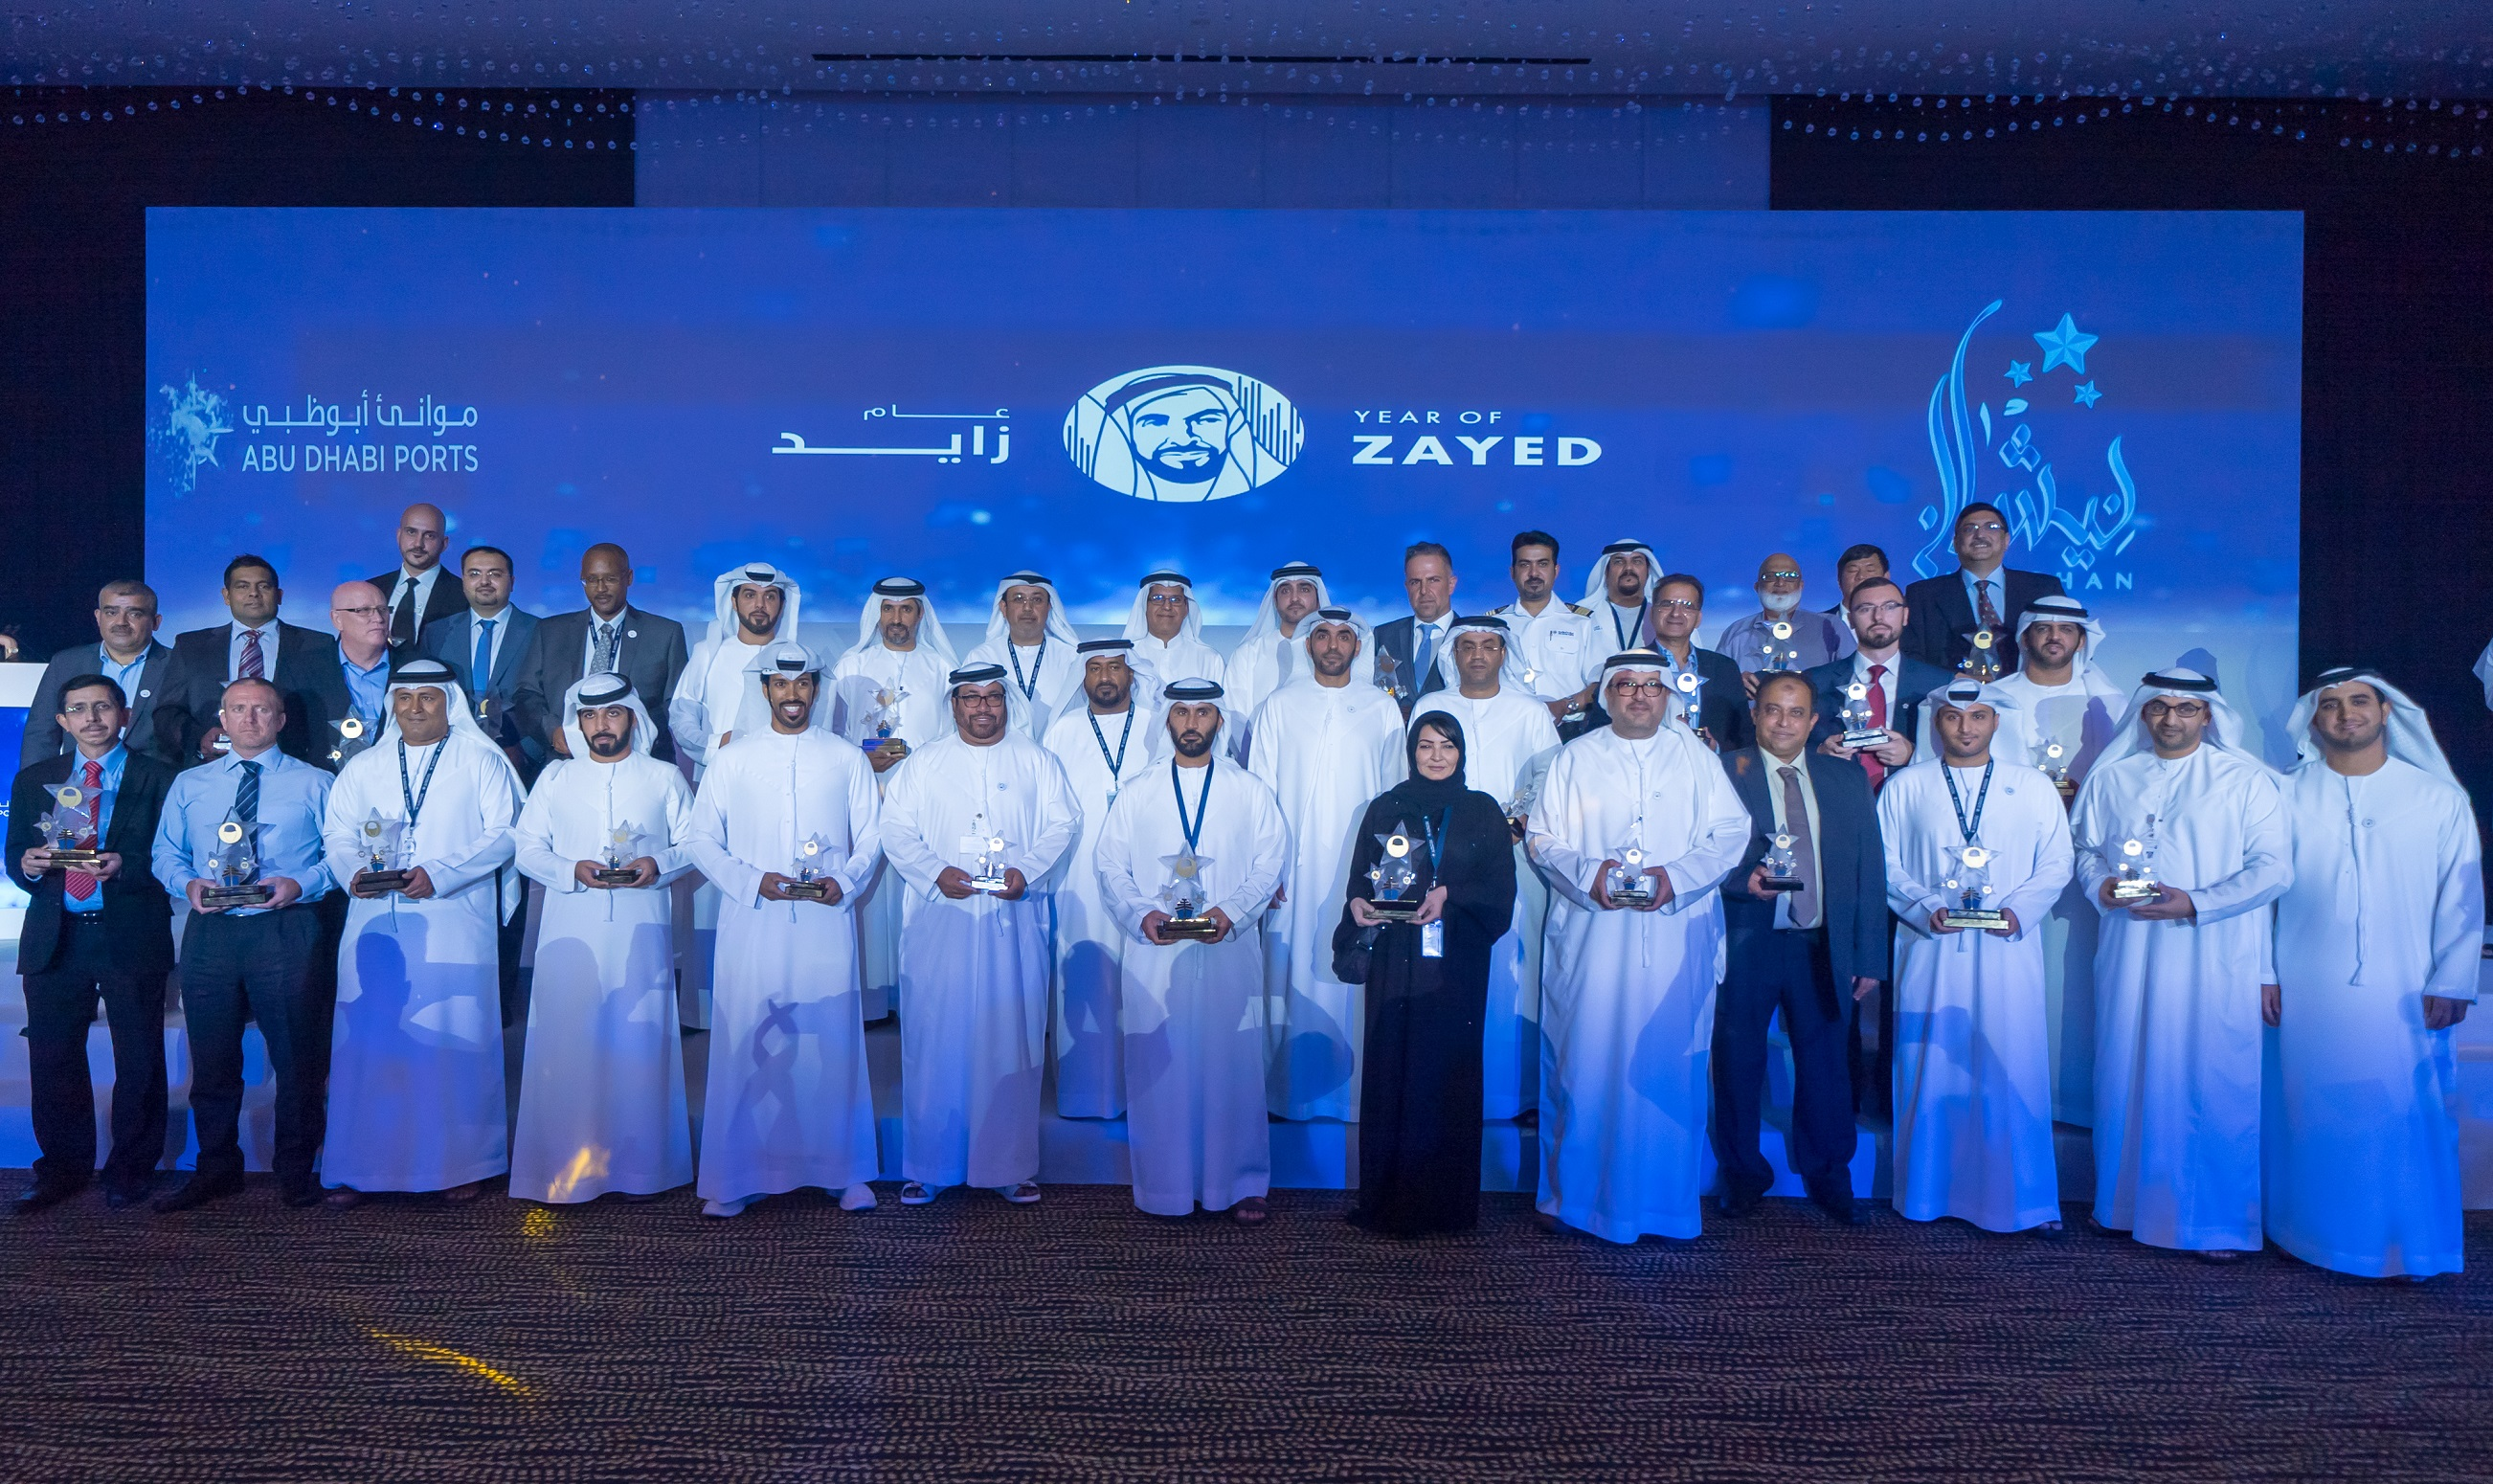 Abu Dhabi Ports NEESHAN Awards ceremony